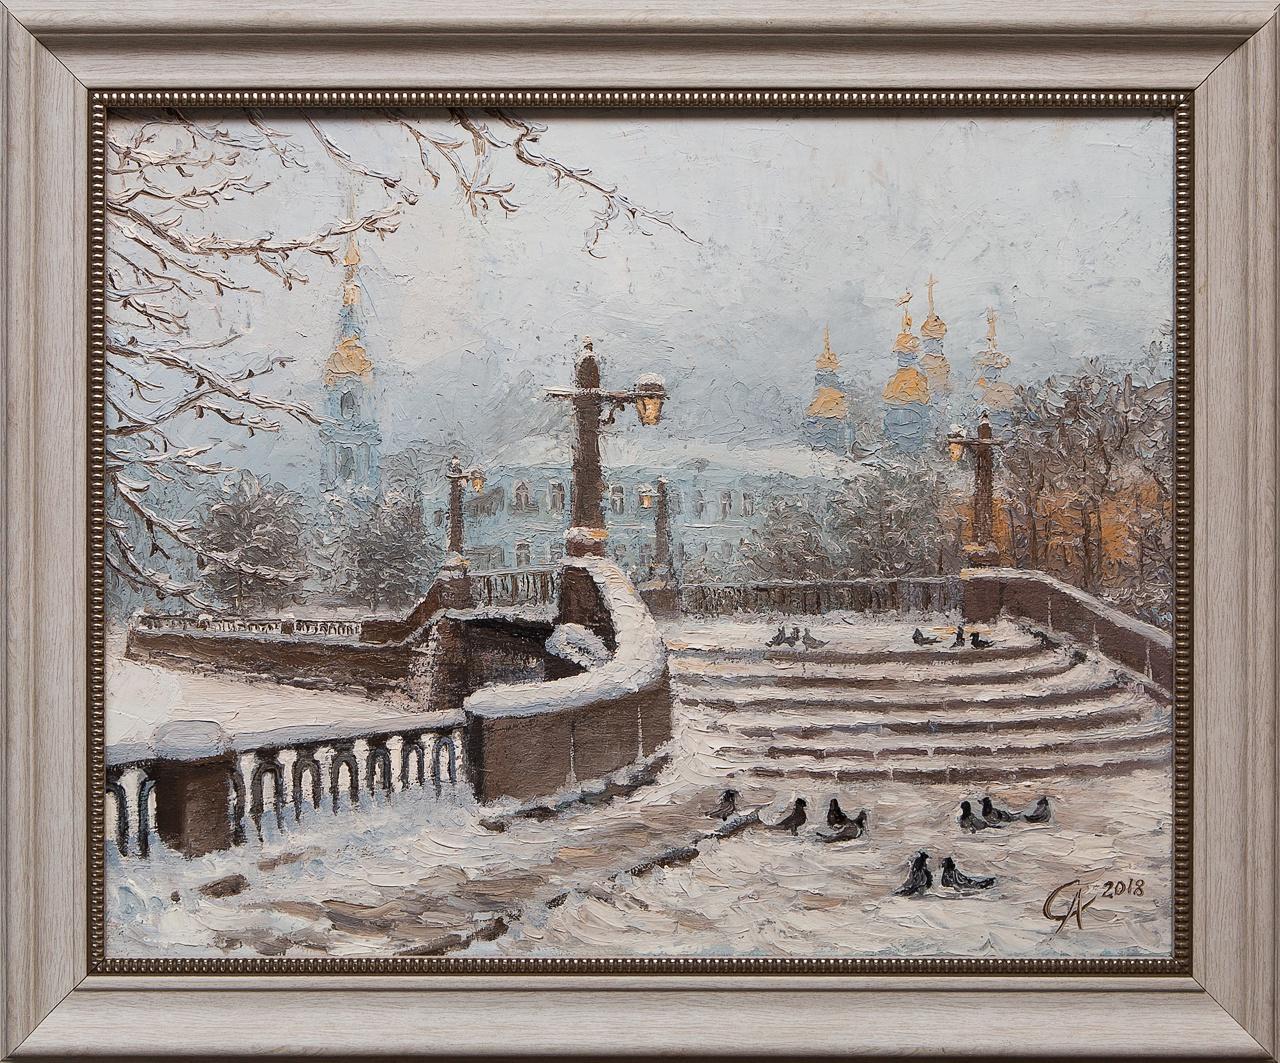 Картина маслом Крюков канал. Зимой Степанков картина маслом биржа степанков